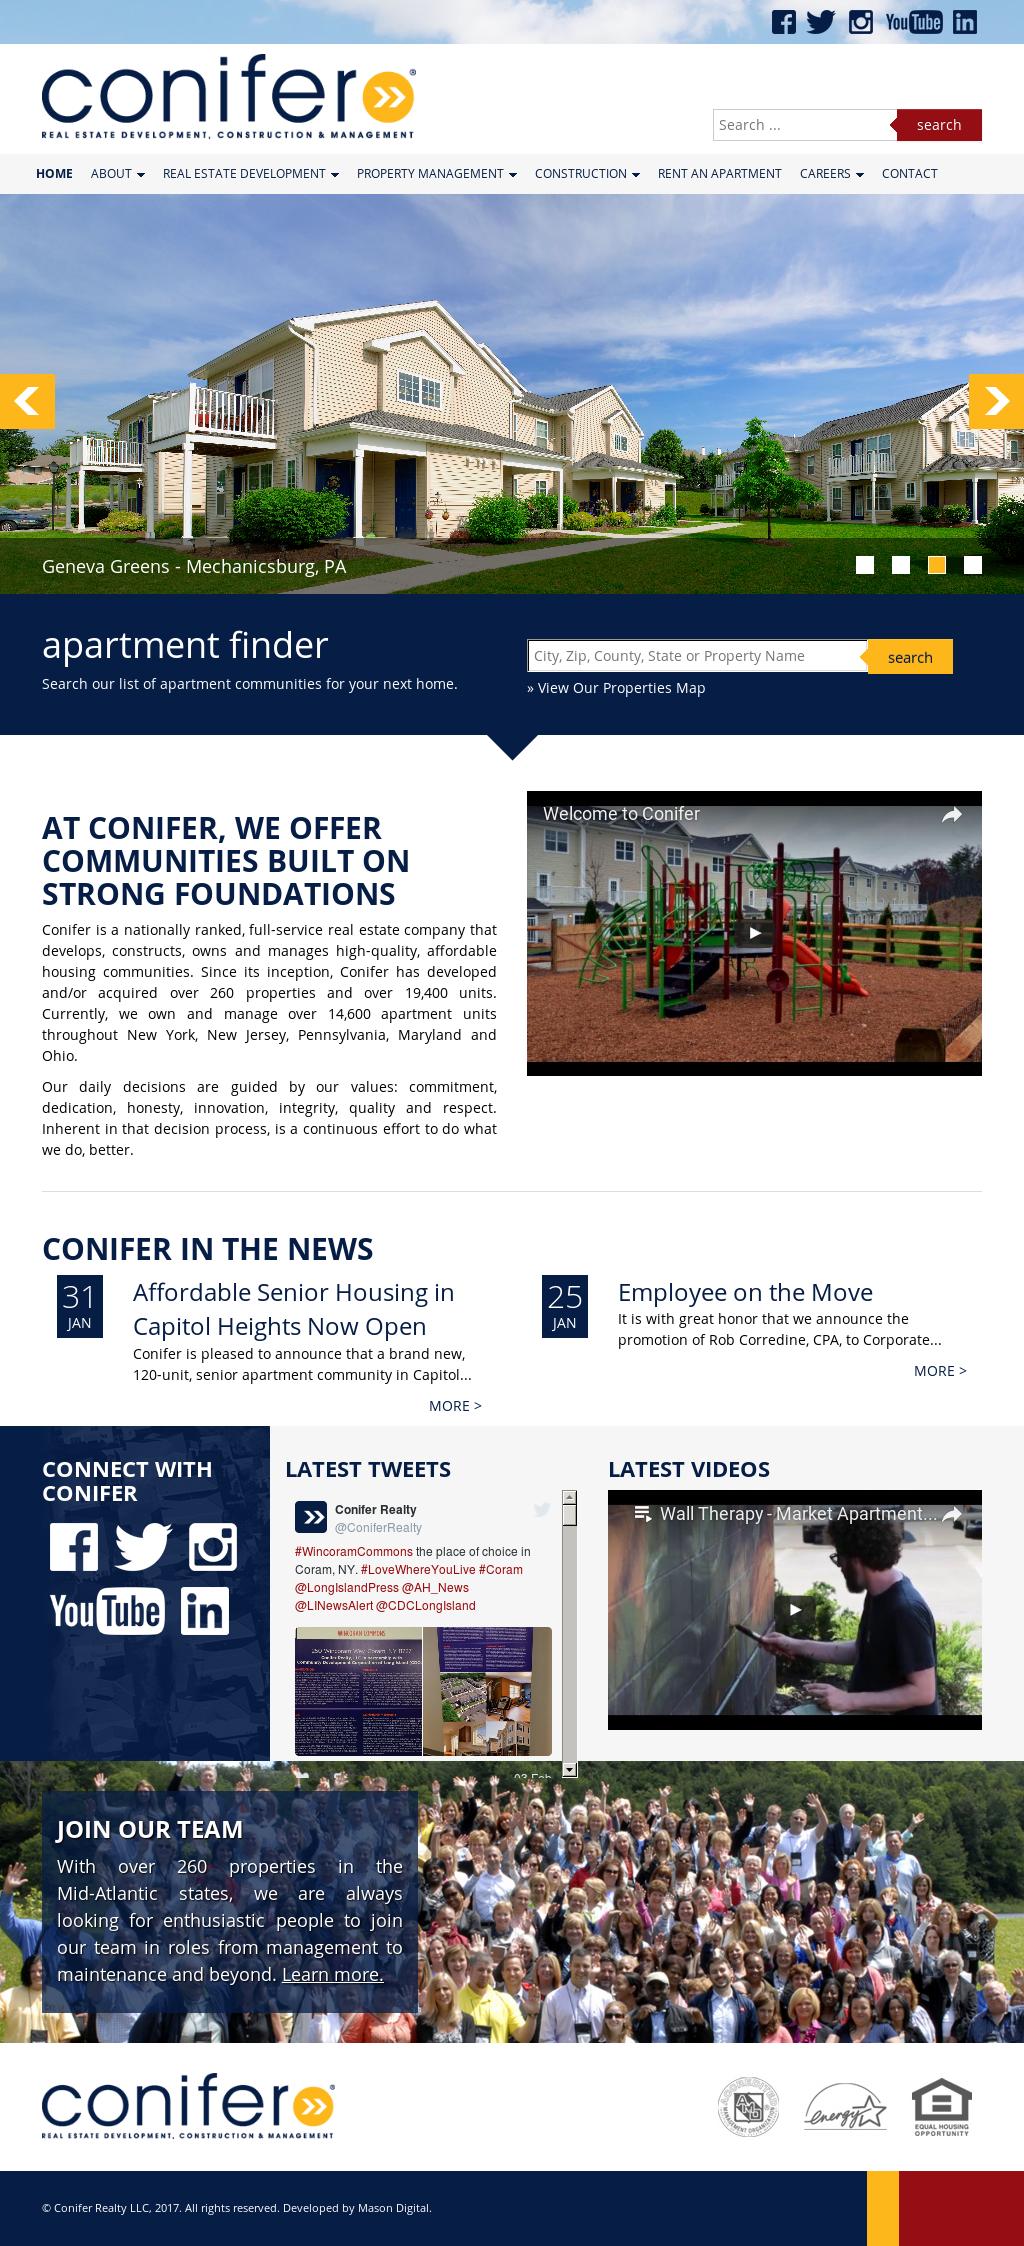 Coniferllc Competitors, Revenue and Employees - Owler